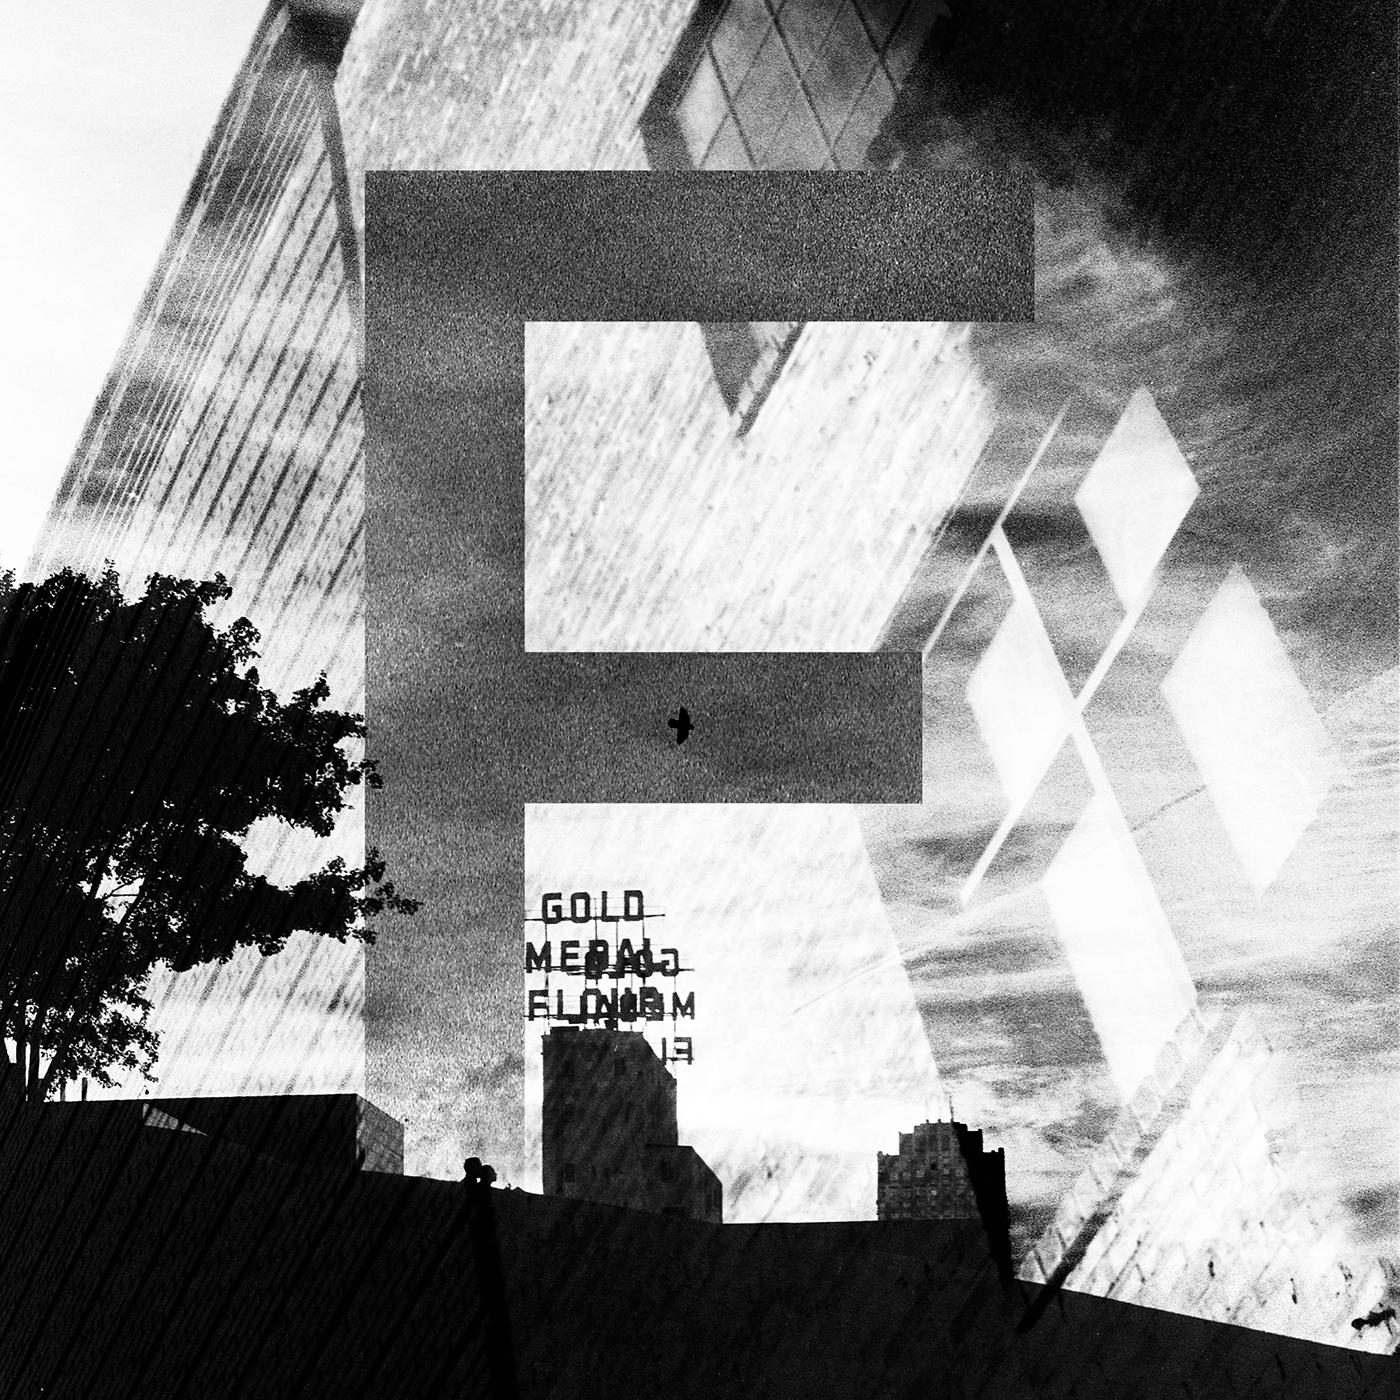 Capital C photographic illuminated letter. Film photograph with digital manipulation.